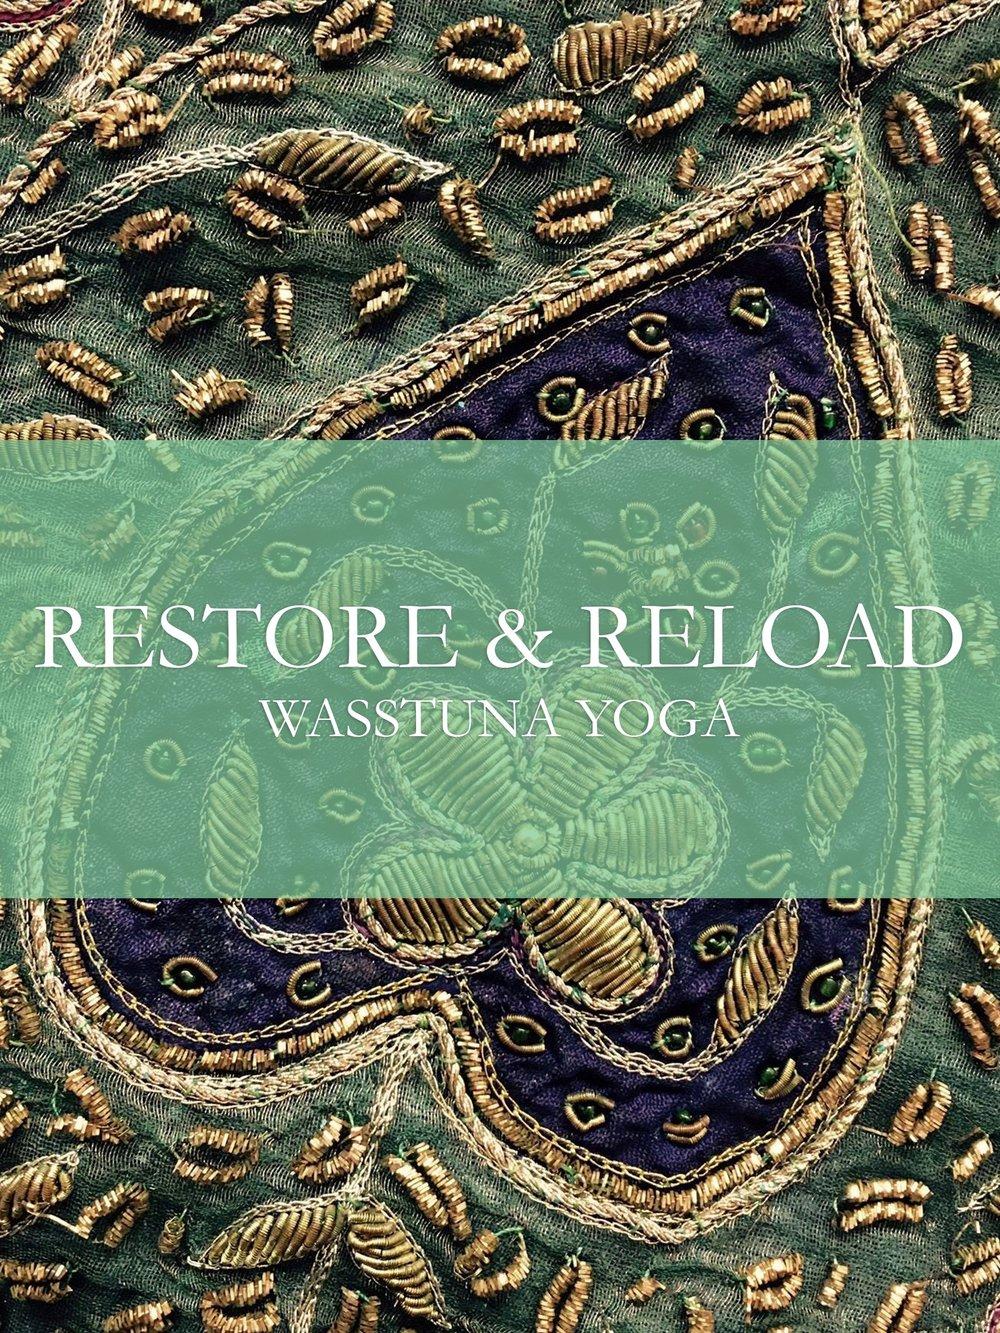 Restor & Reload 1.jpg